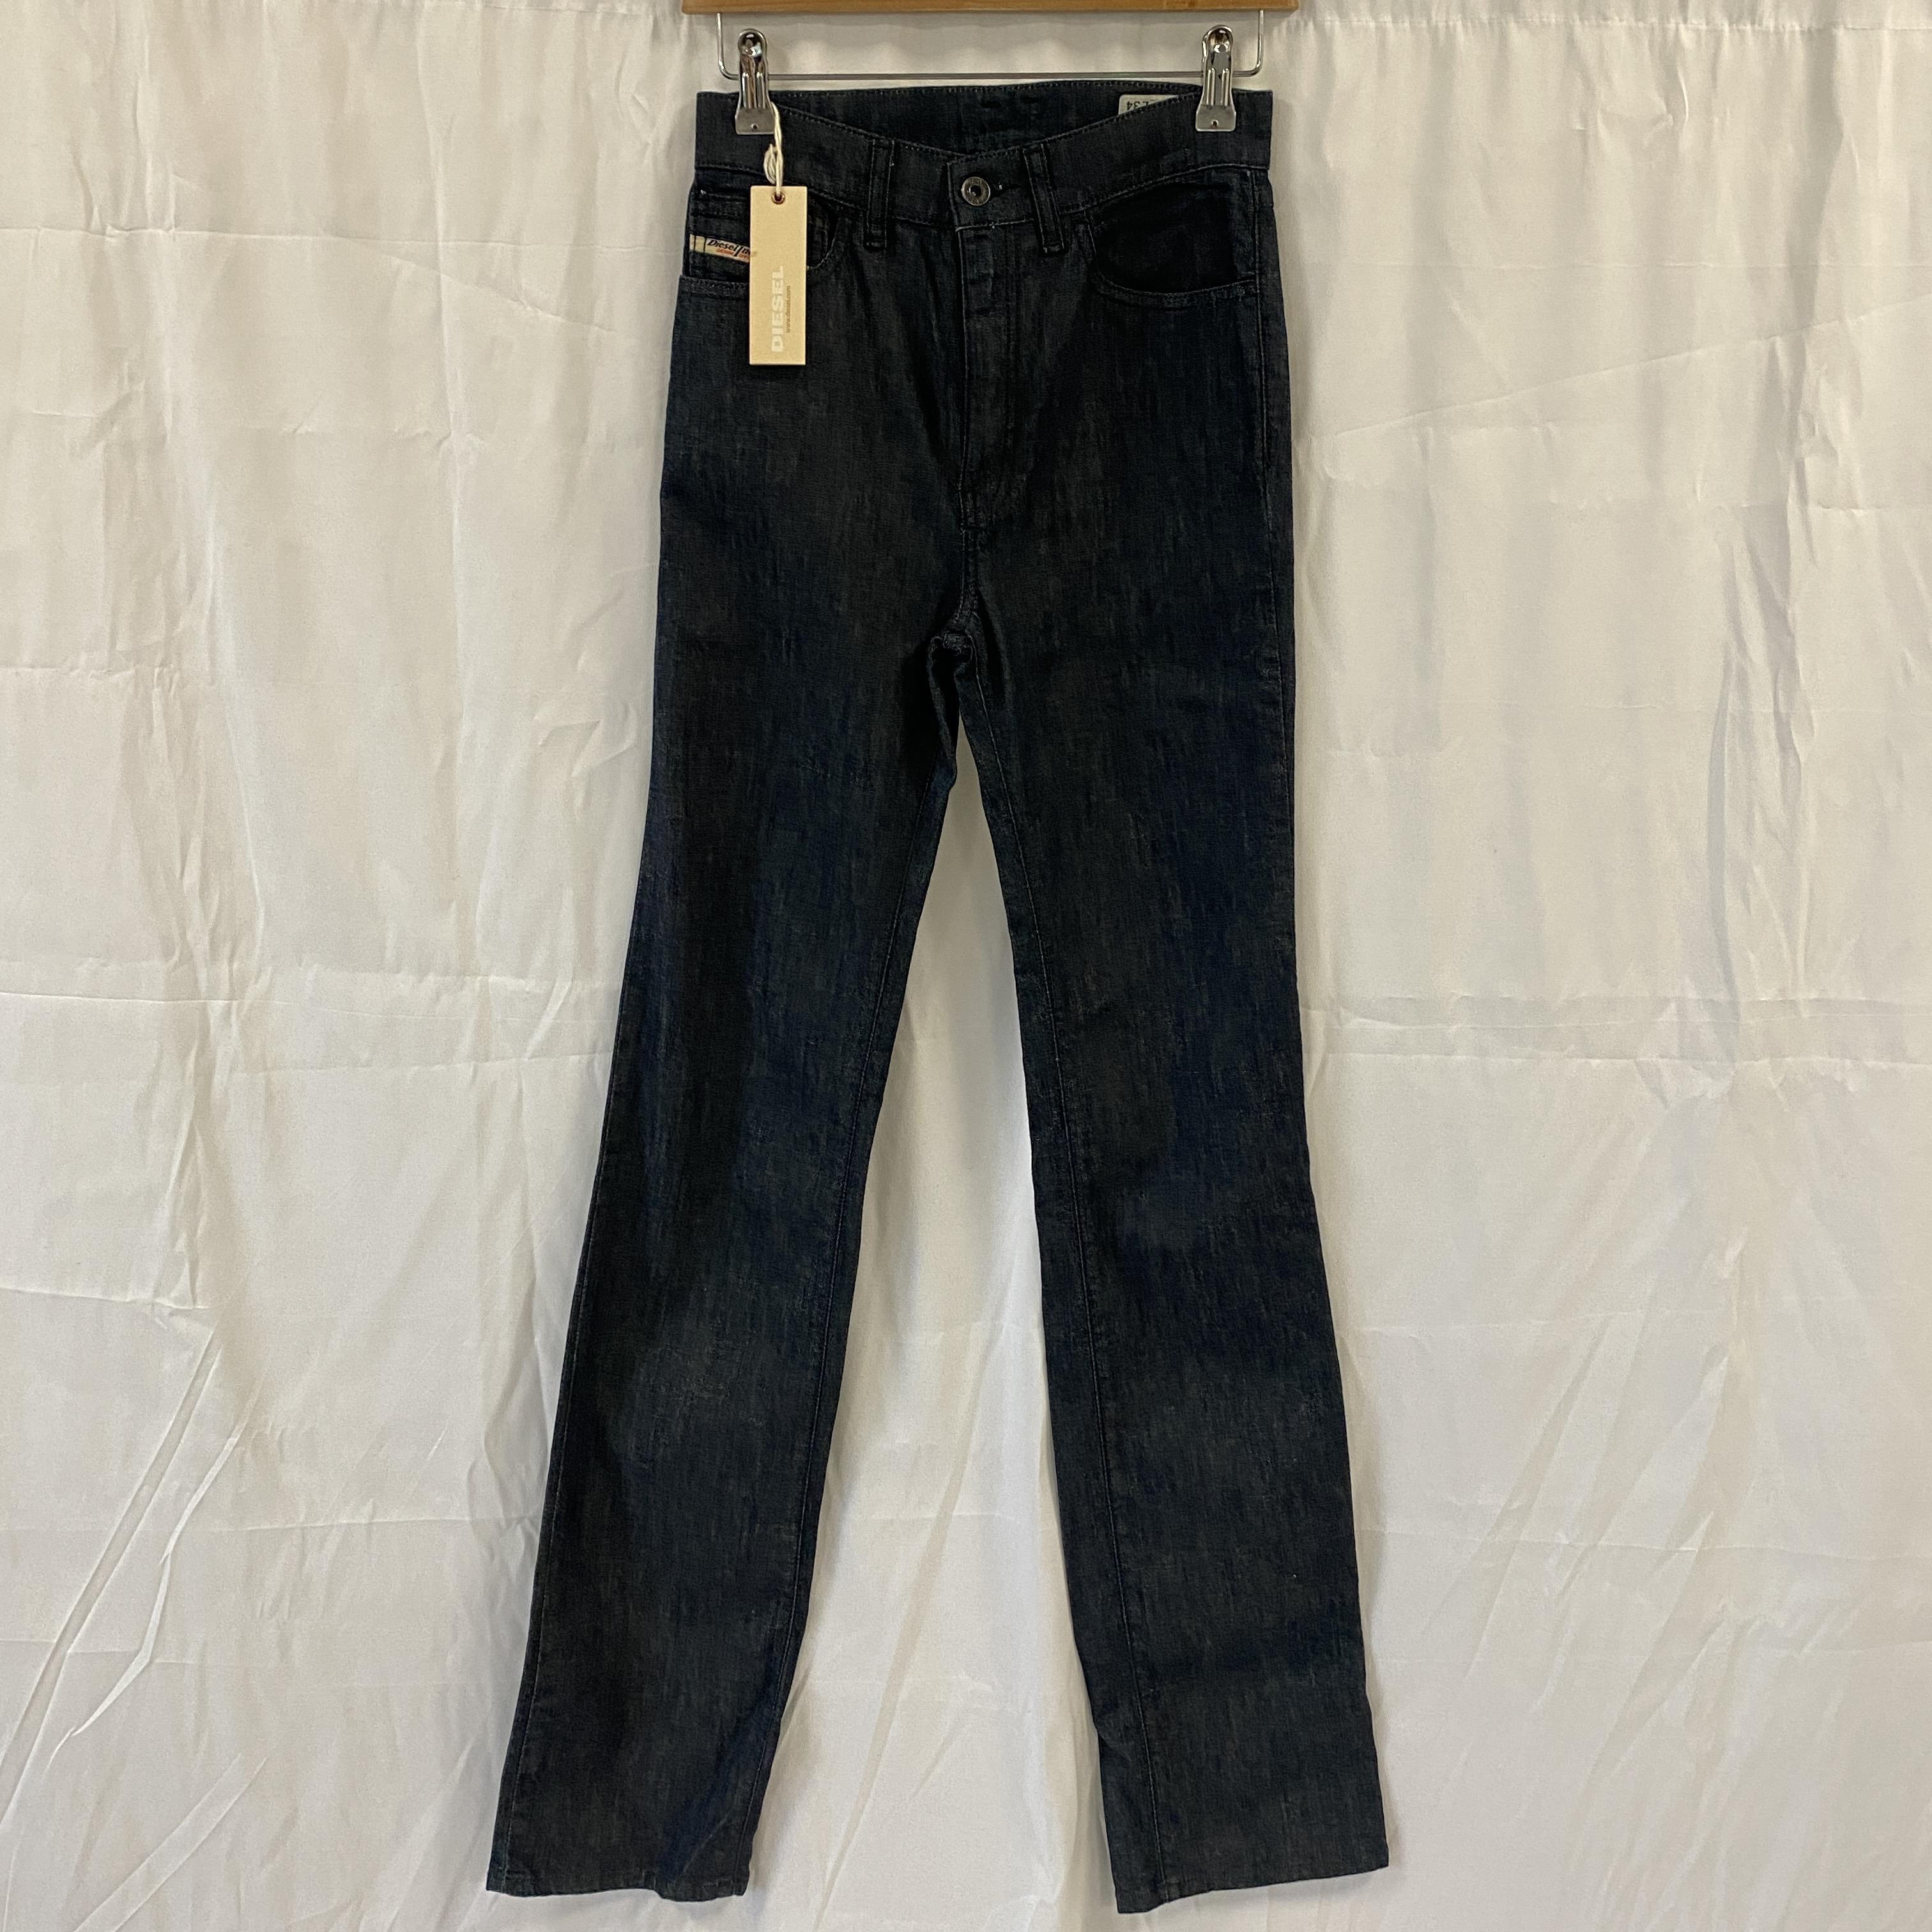 Brand New Diesel Jeans - Waist 27 Length 34